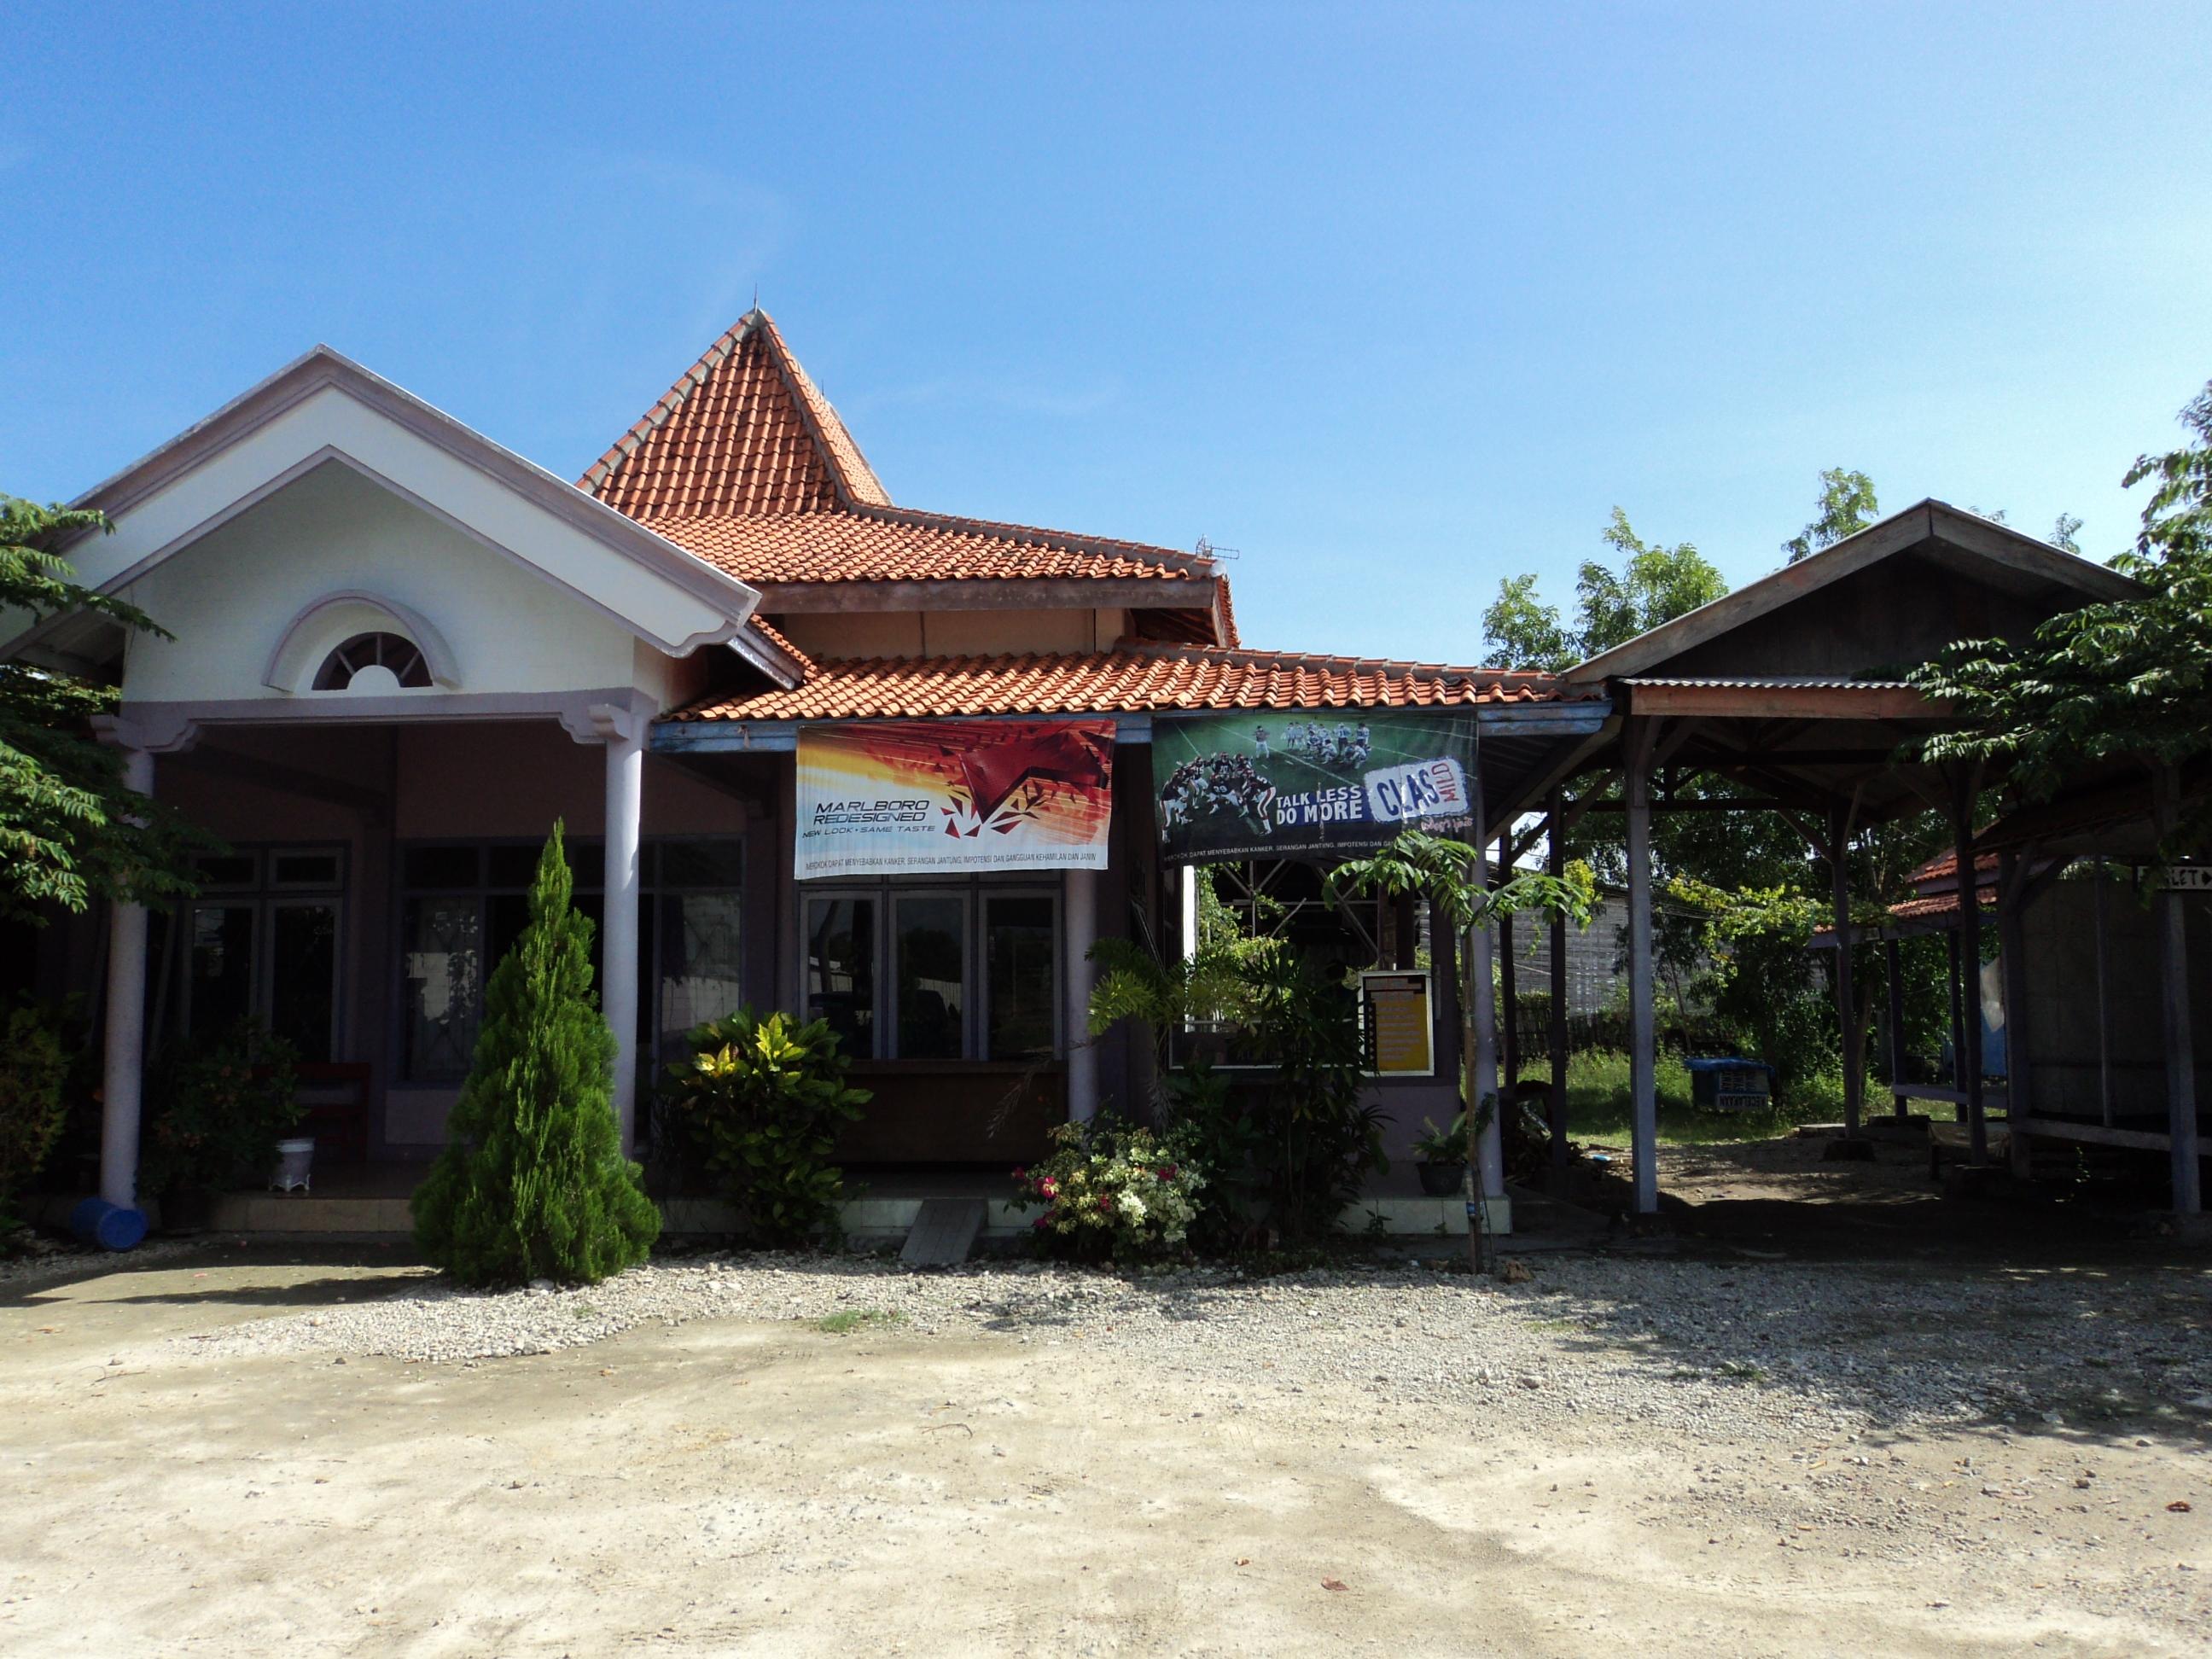 Wisata Kuliner Madura Odyssey Rm Arwana Citra Stasiun Kereta Api